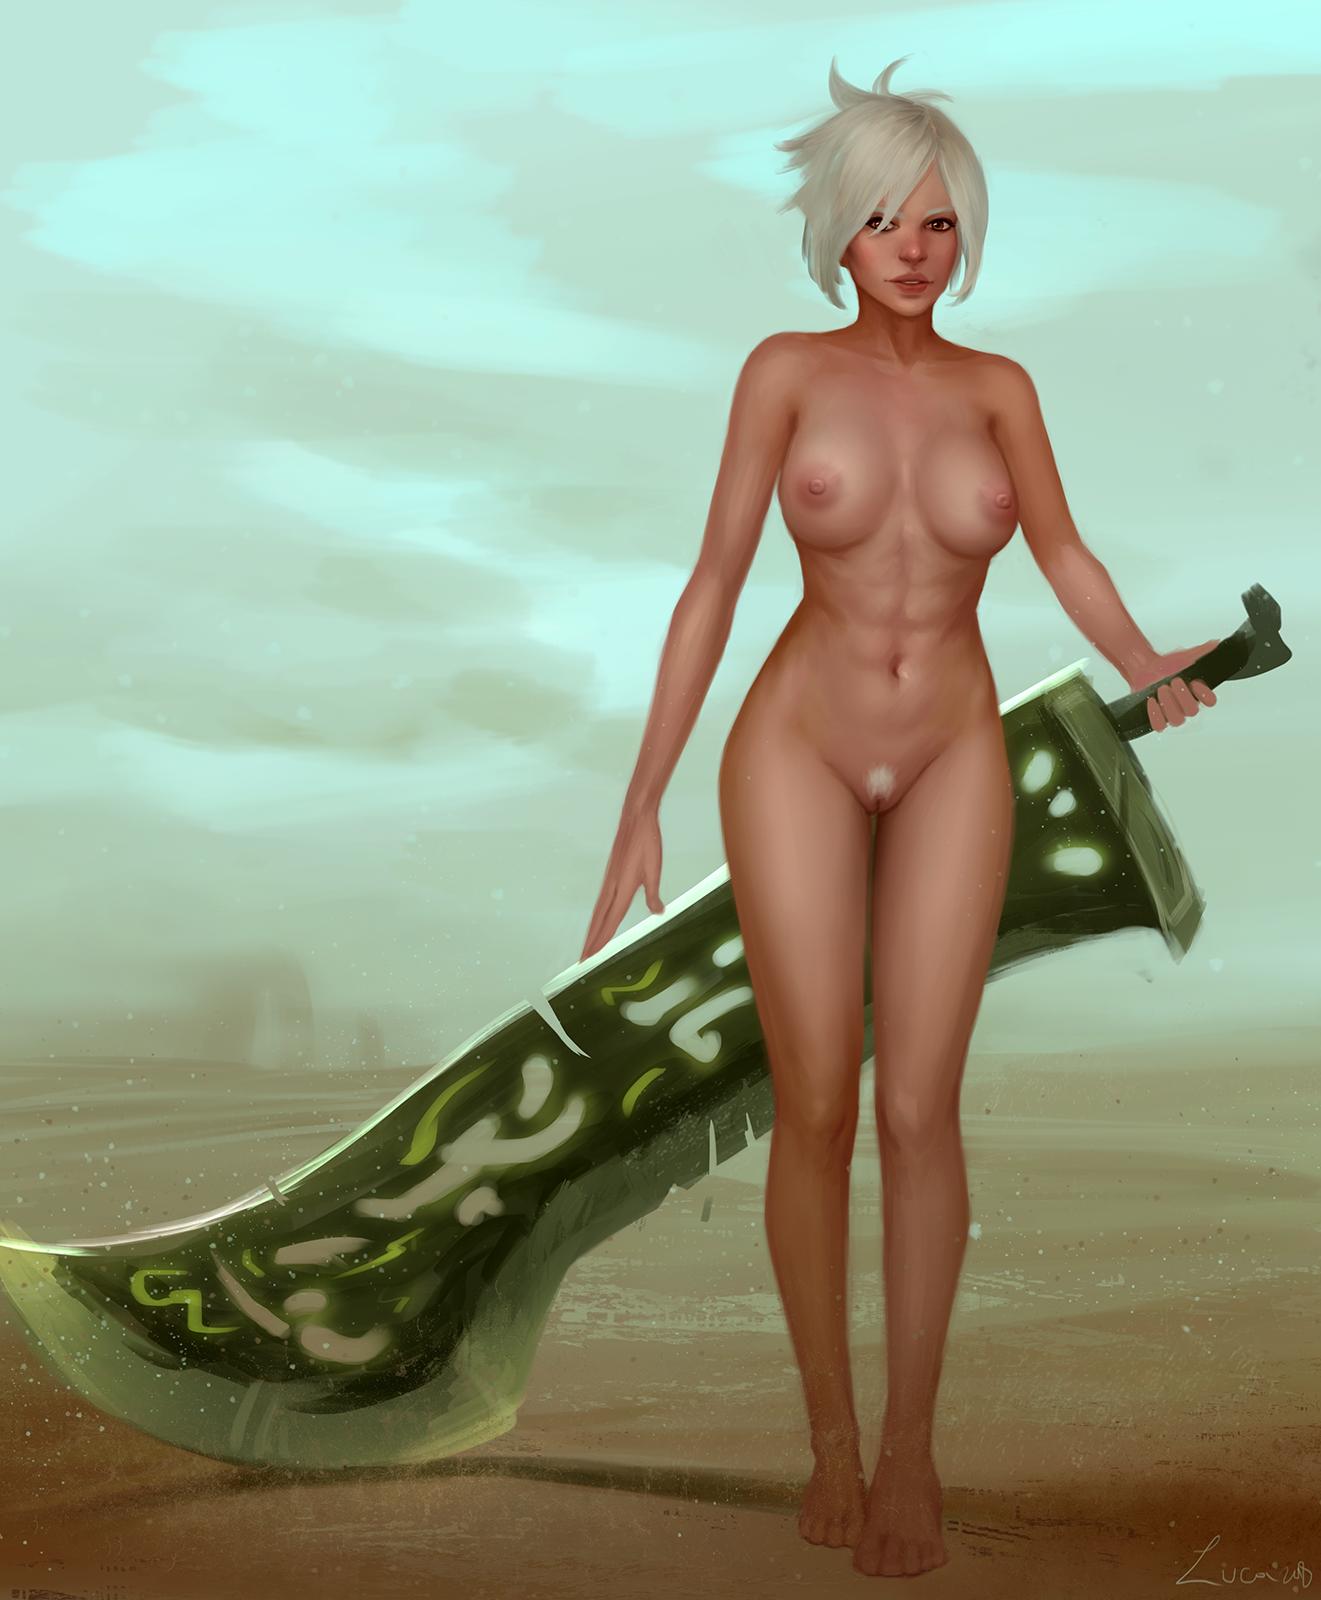 2748524 - League_of_Legends Riven luccass22